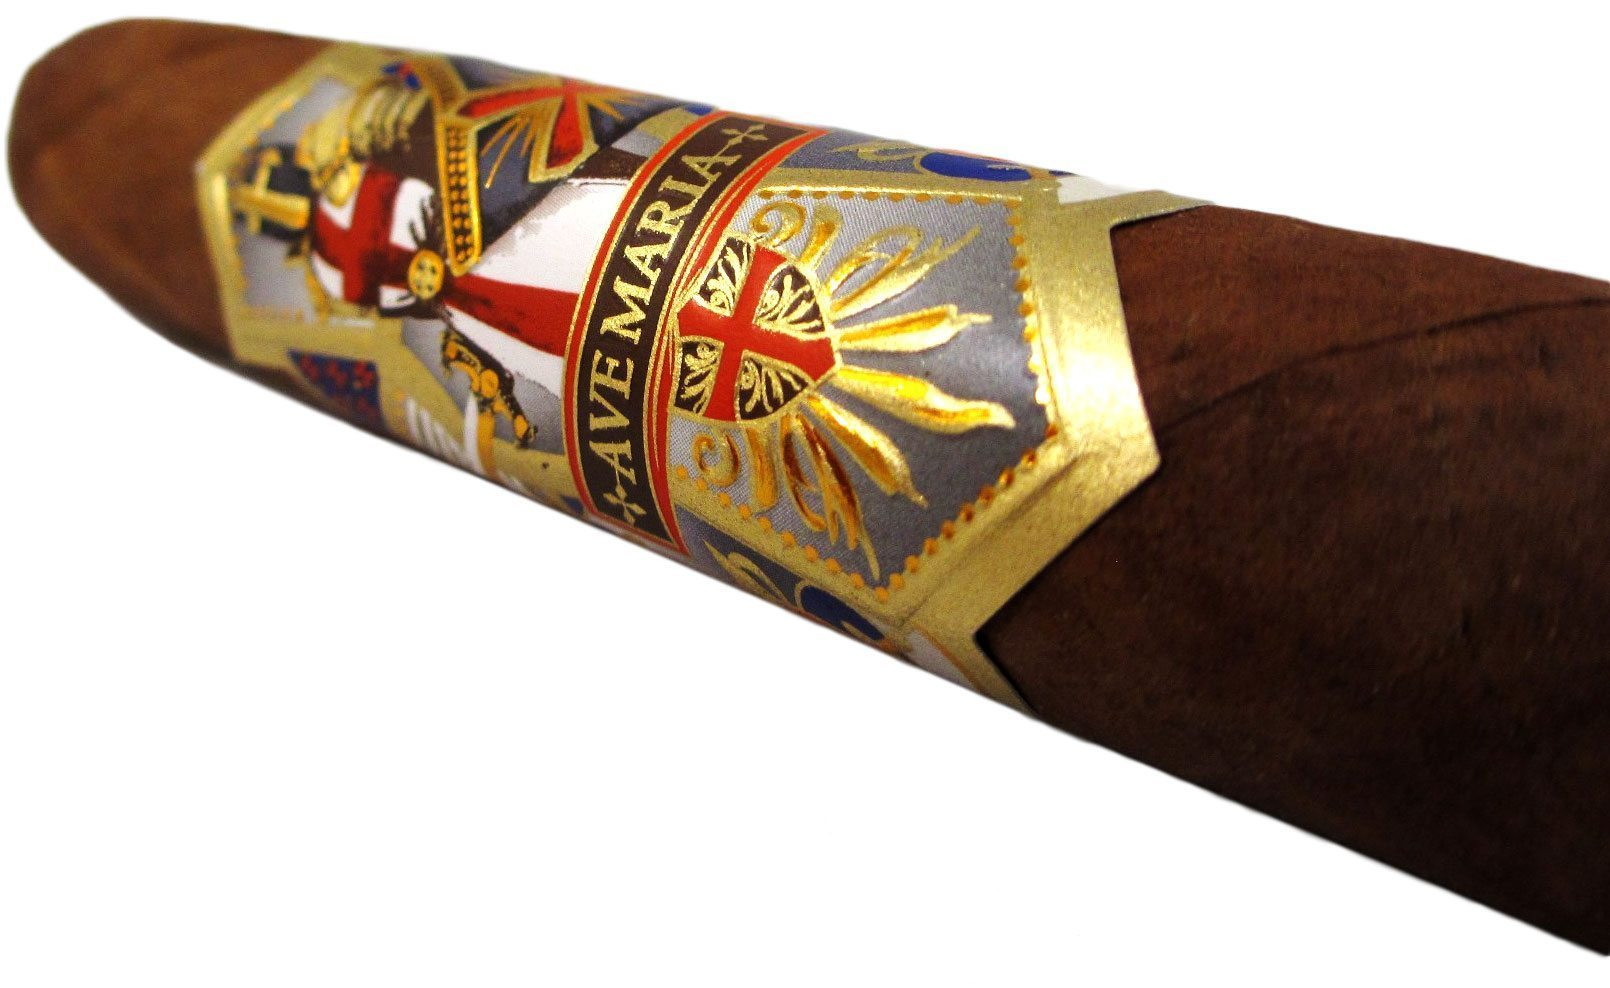 Blind Cigar Review: Ave Maria | Knights Templar